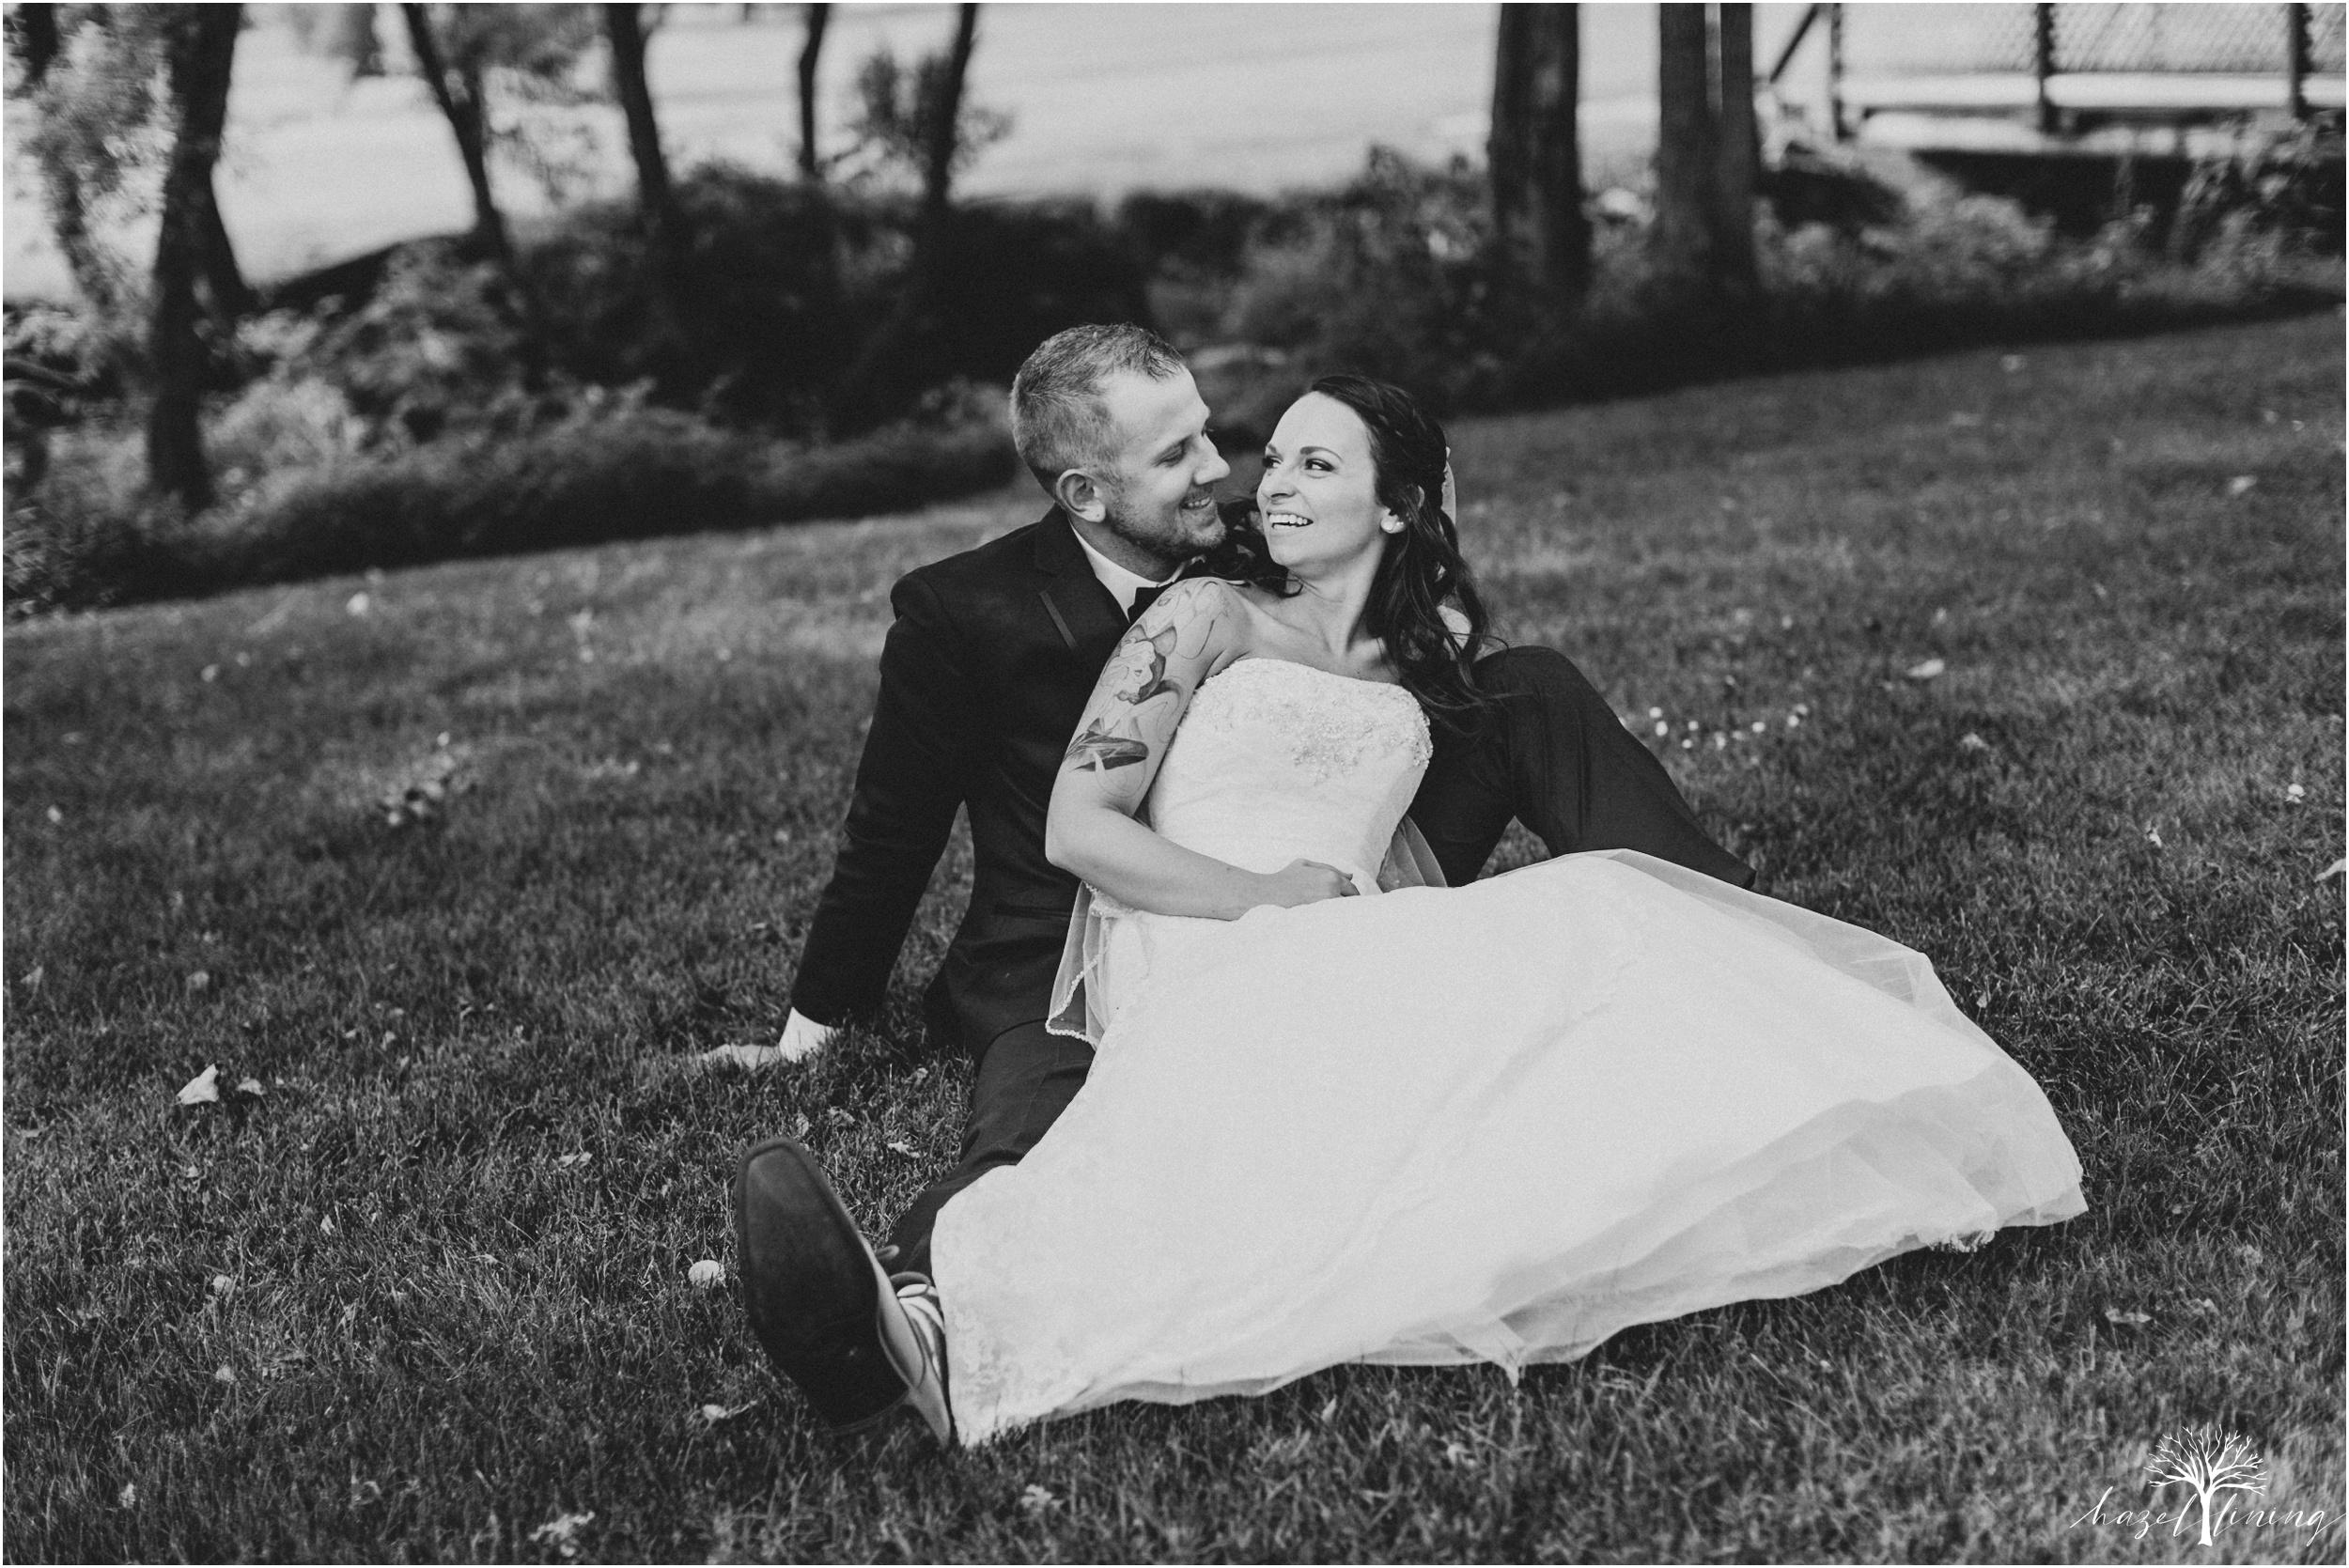 alyssa-james-stiteler-wedding-loft-and-sweet-water-cc-pennsburg-pennsylvania-hazel-lining-travel-wedding-elopement-photography_0105.jpg